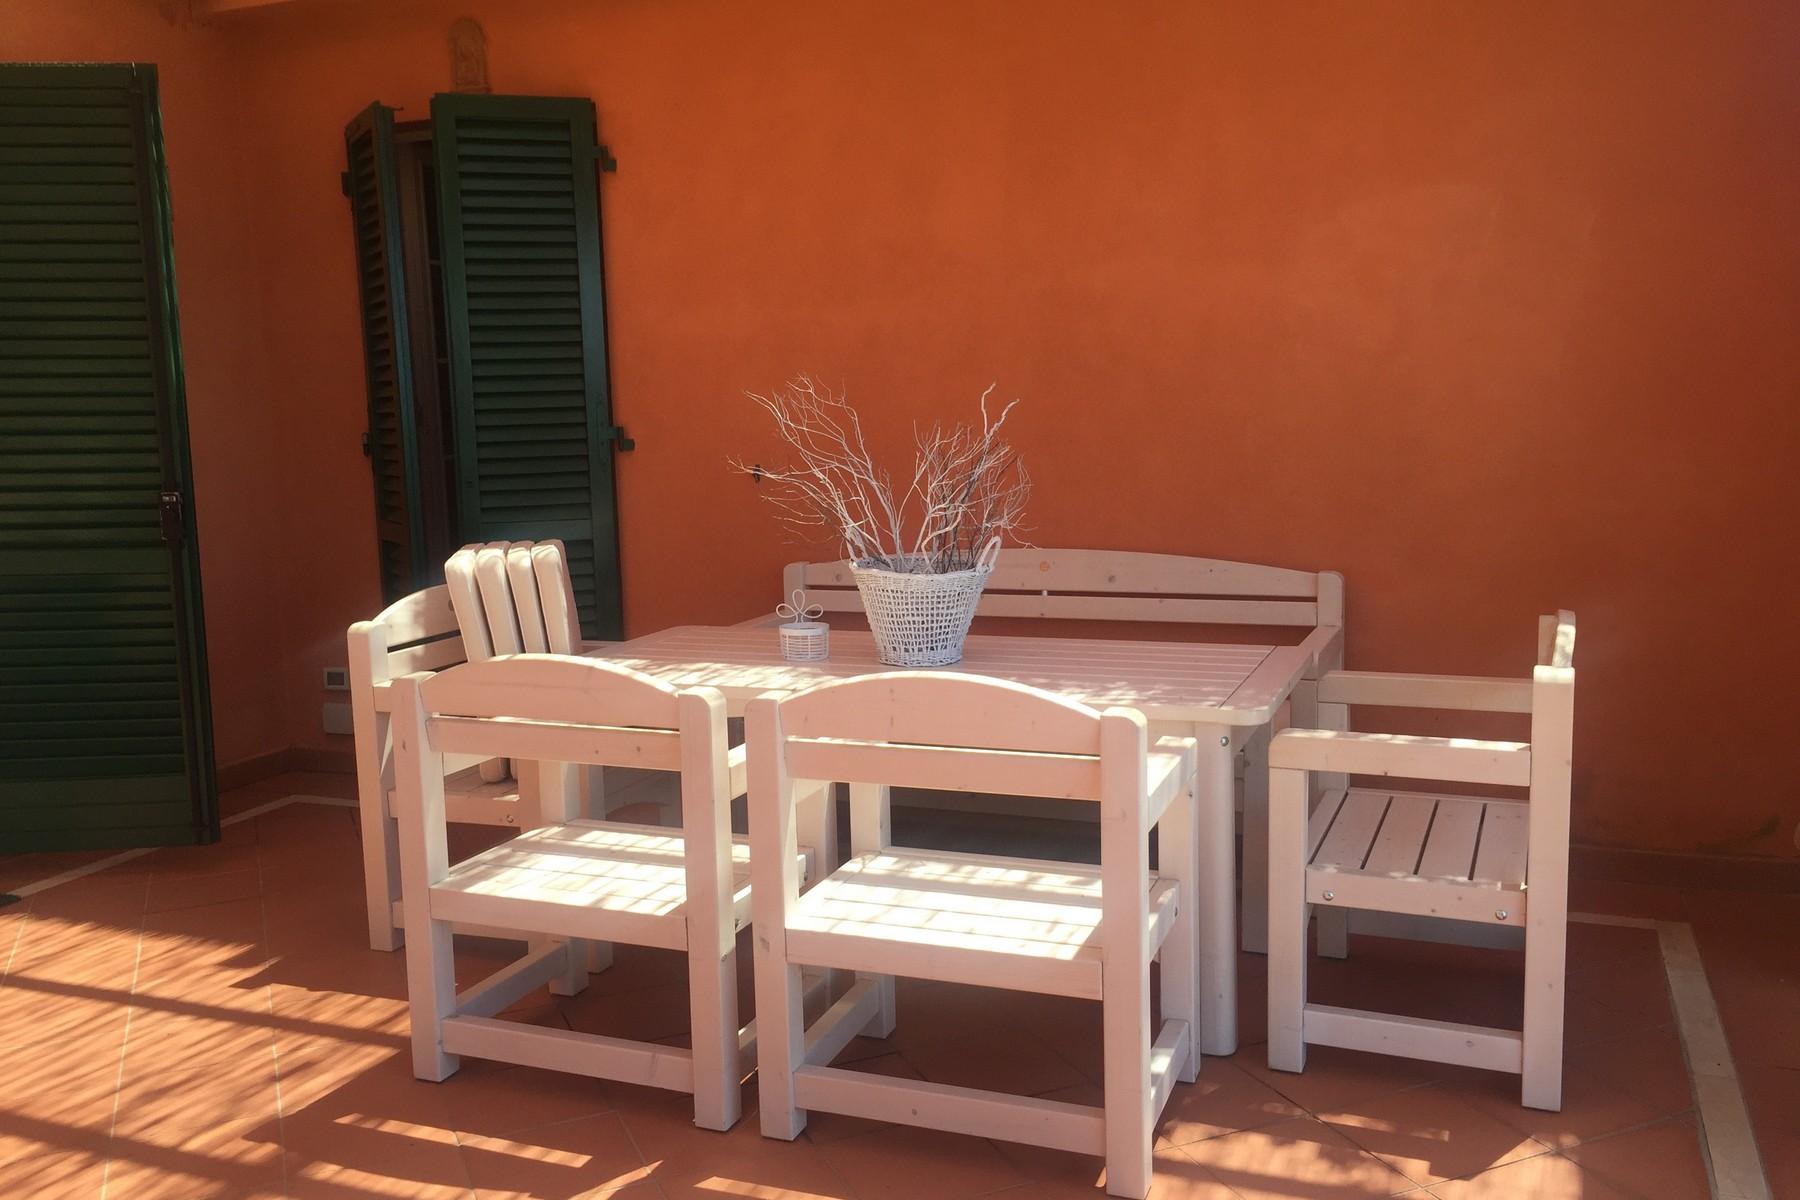 Casa indipendente in Vendita a Capoliveri: 5 locali, 190 mq - Foto 9